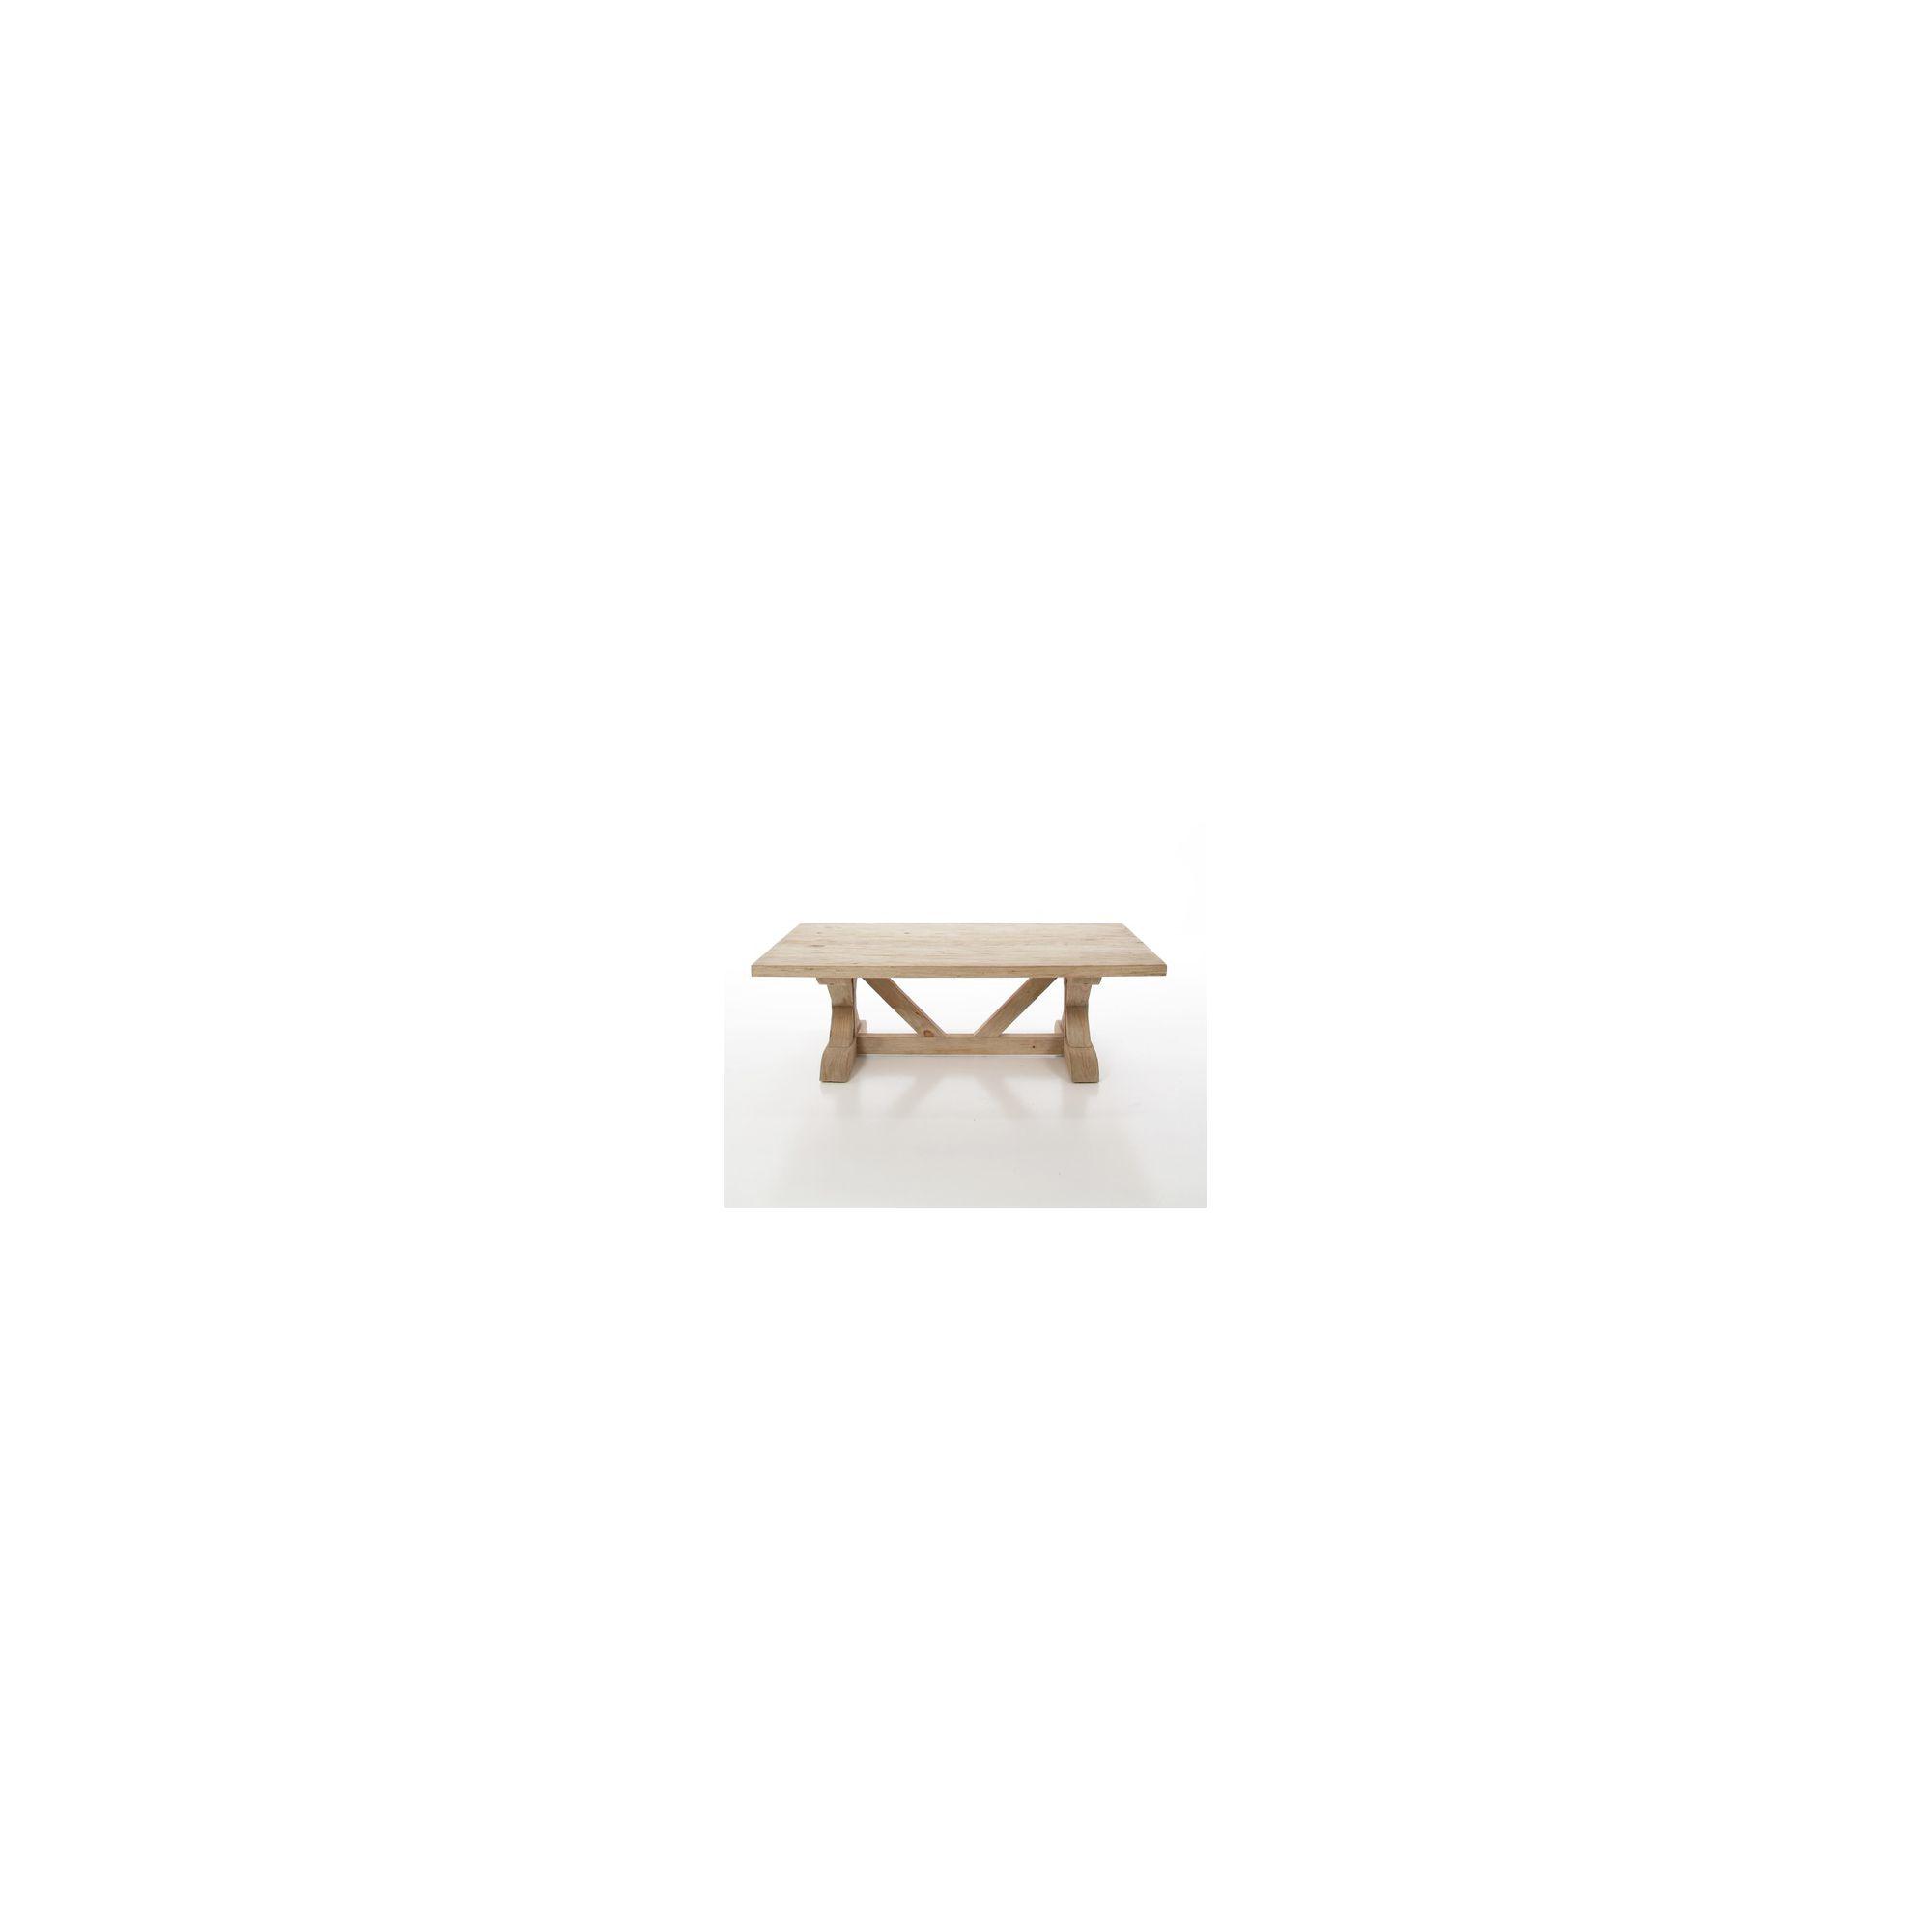 Aspect Design Seine Coffee Table at Tesco Direct